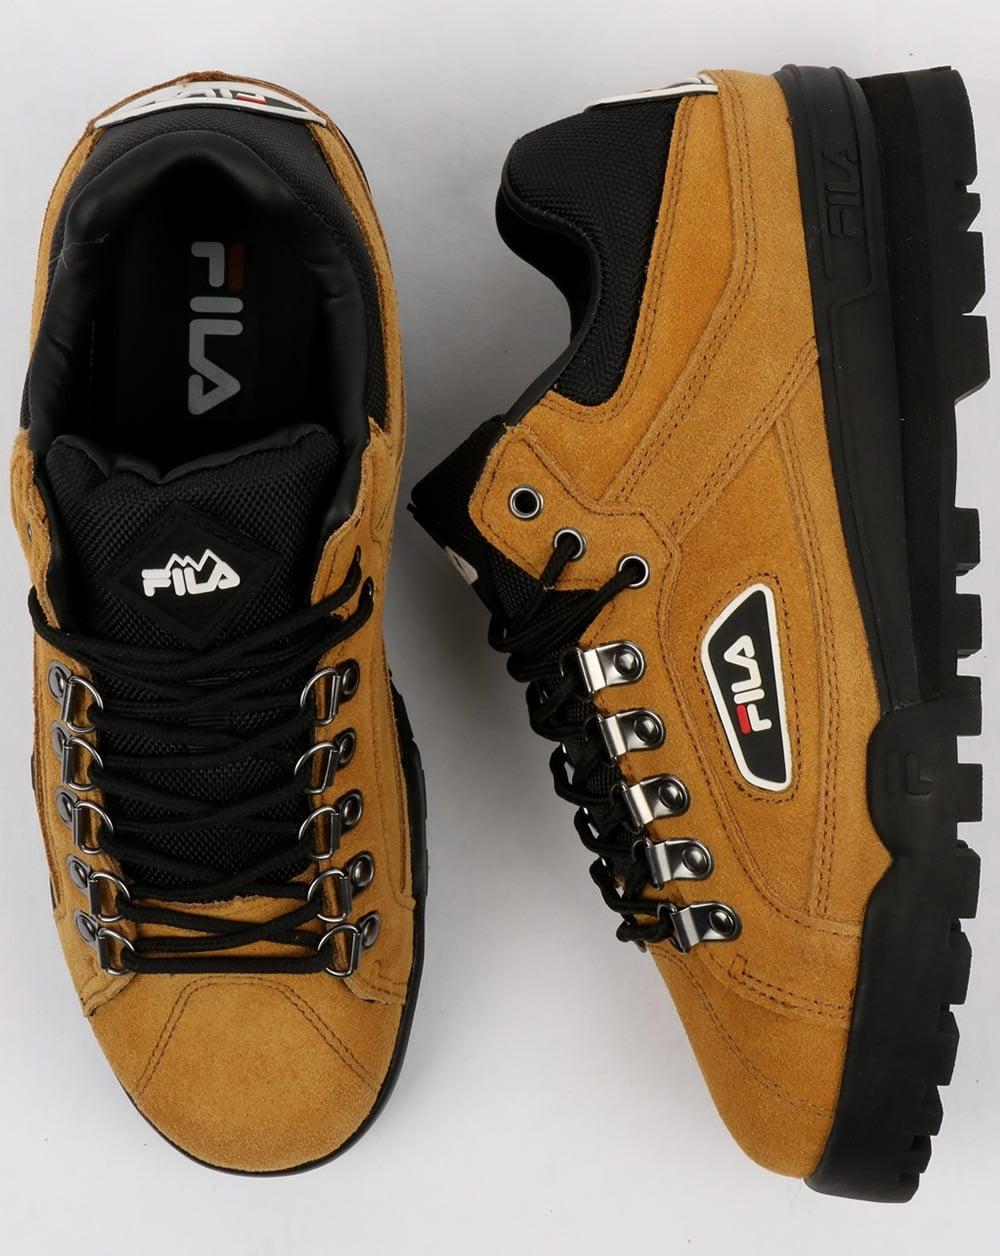 90f183b5b990 Fila Vintage Trailblazer Suede Boots Honey Mustard